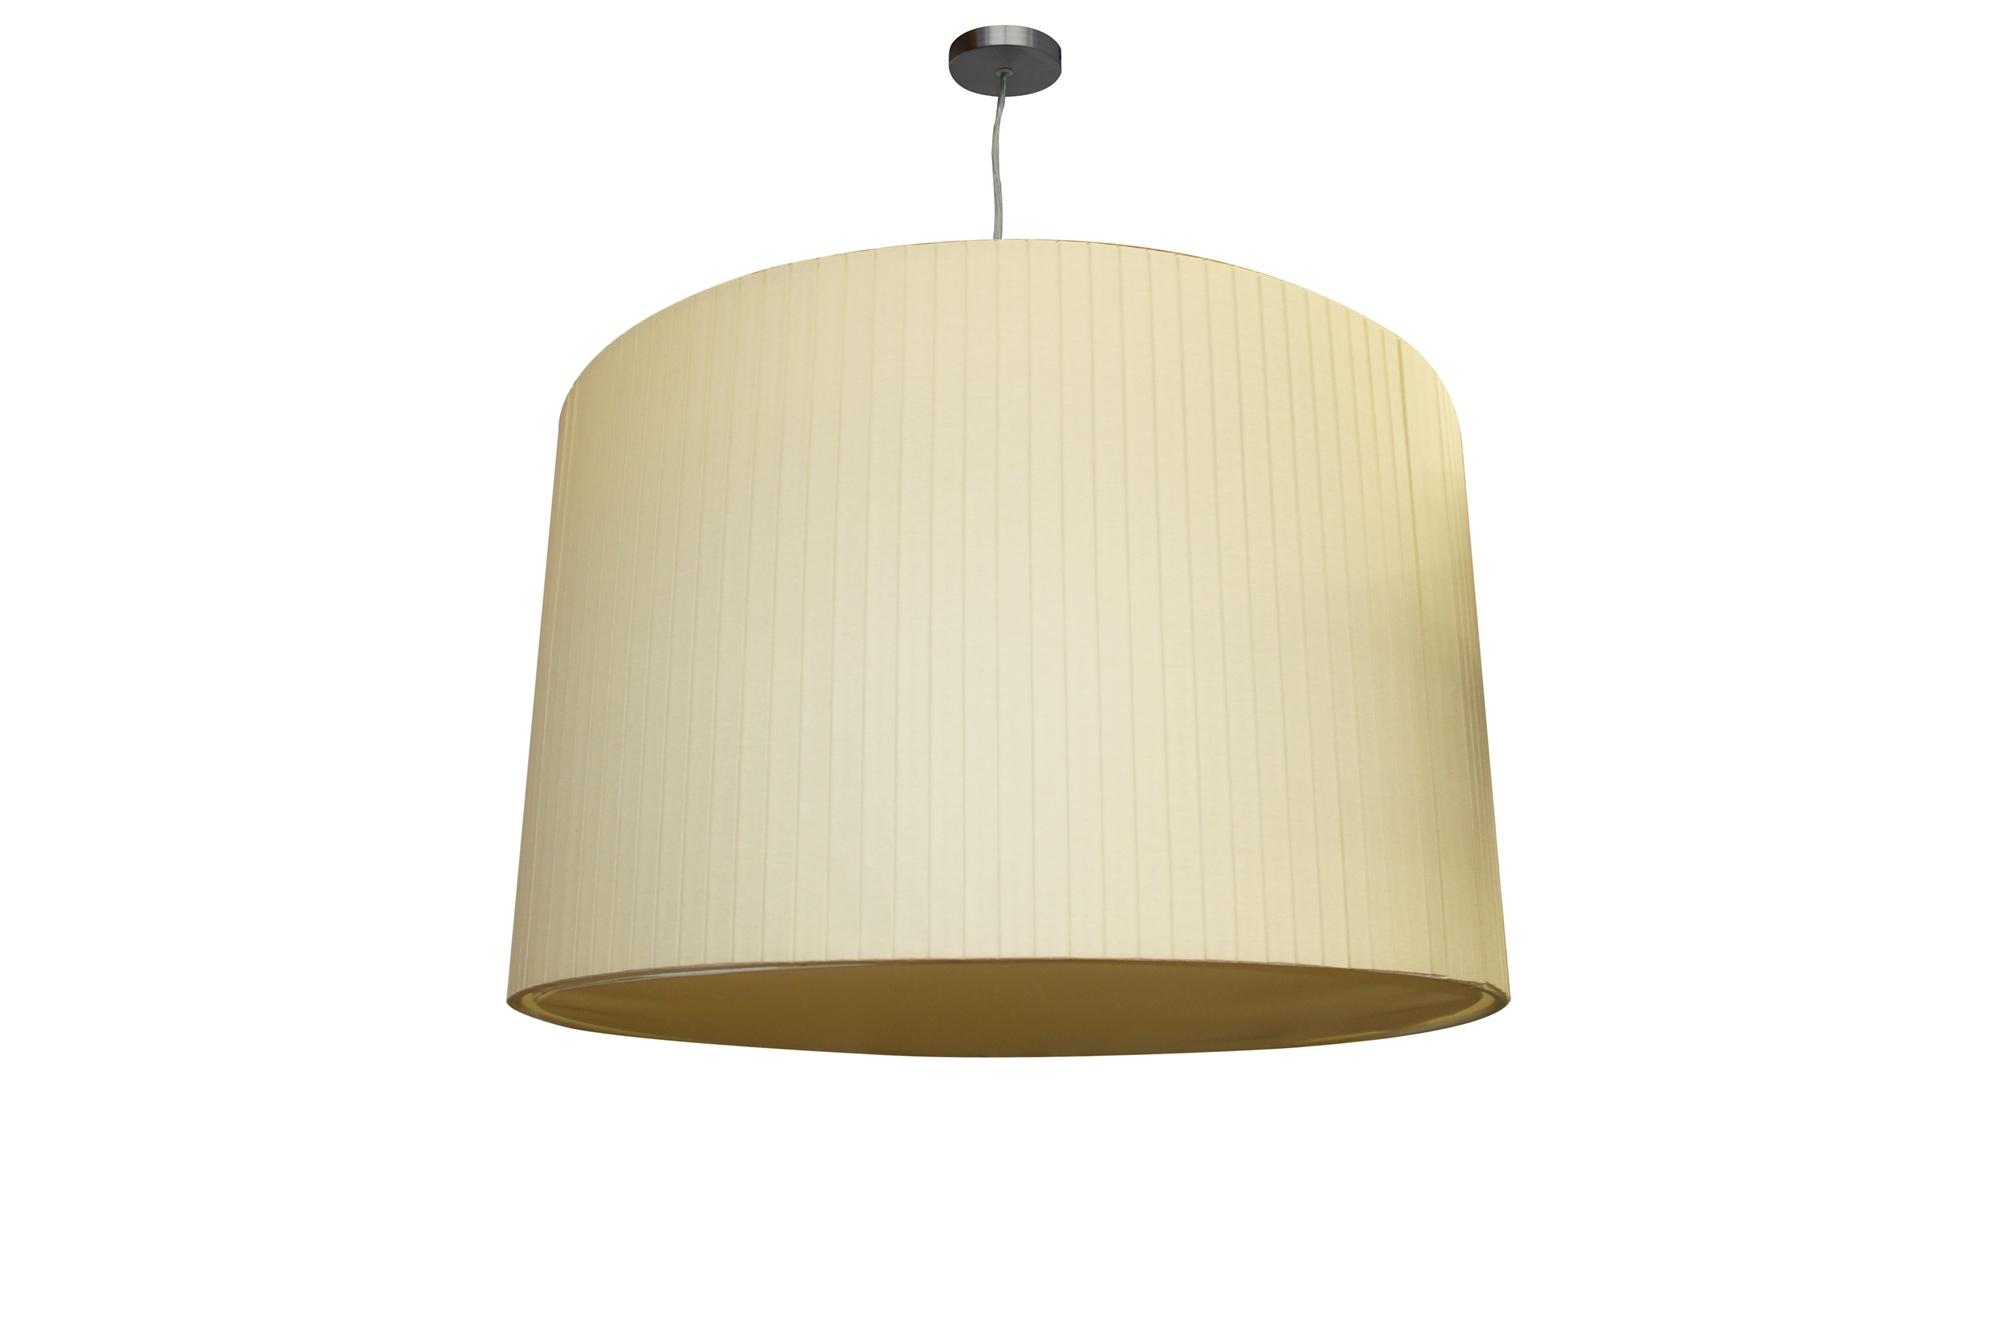 led deckenlampe deckenleuchte retro boxplissee beige mit. Black Bedroom Furniture Sets. Home Design Ideas